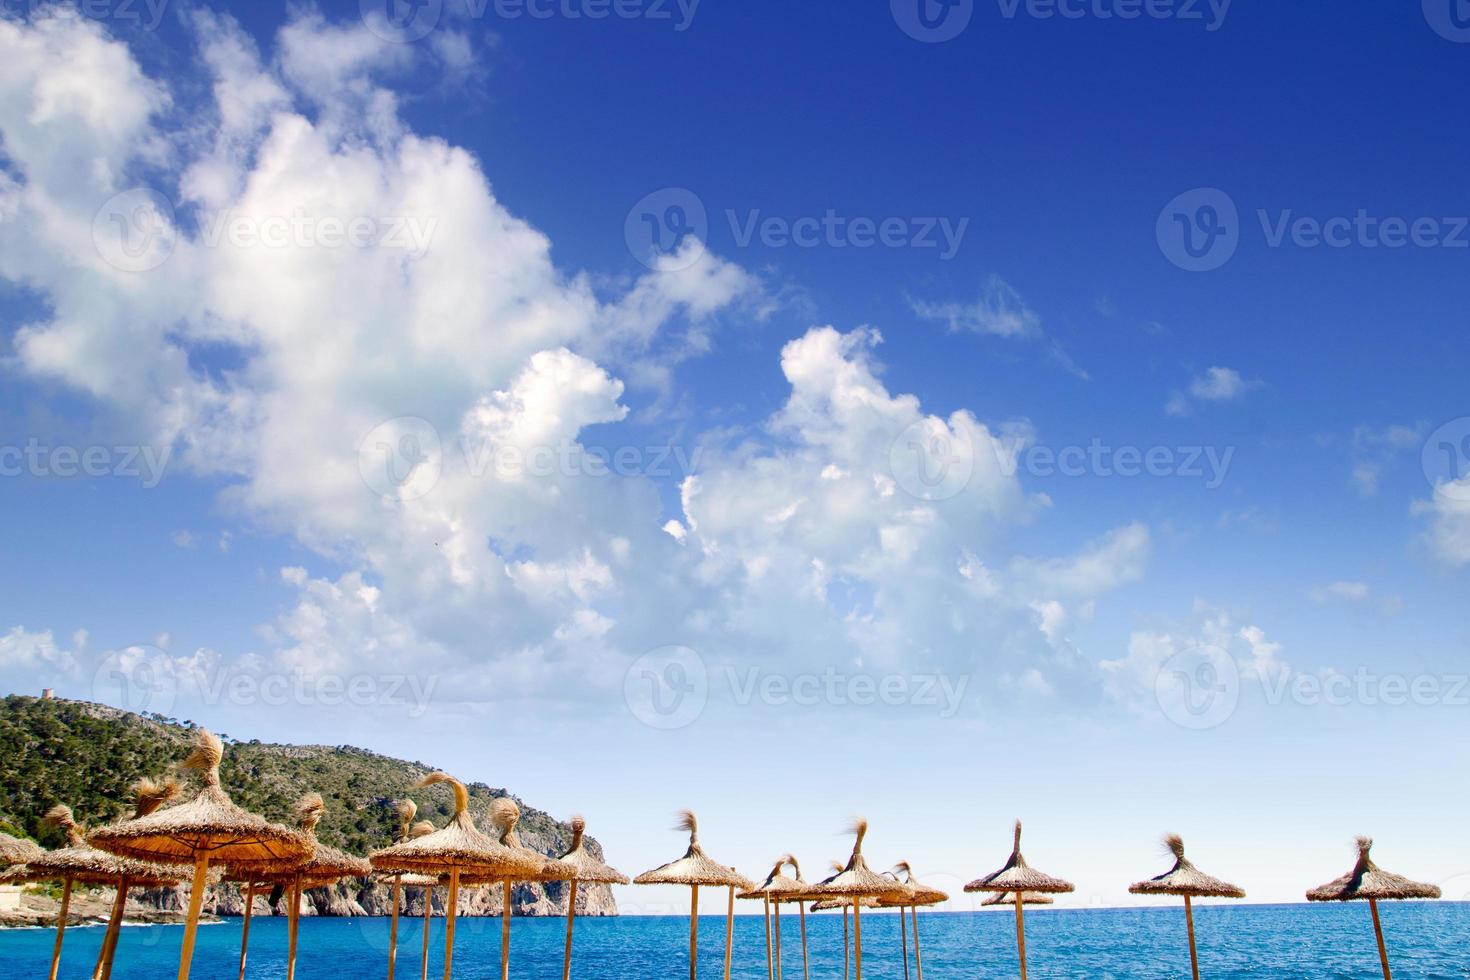 Camp de Mar in Andratx von der Baleareninsel Mallorca foto